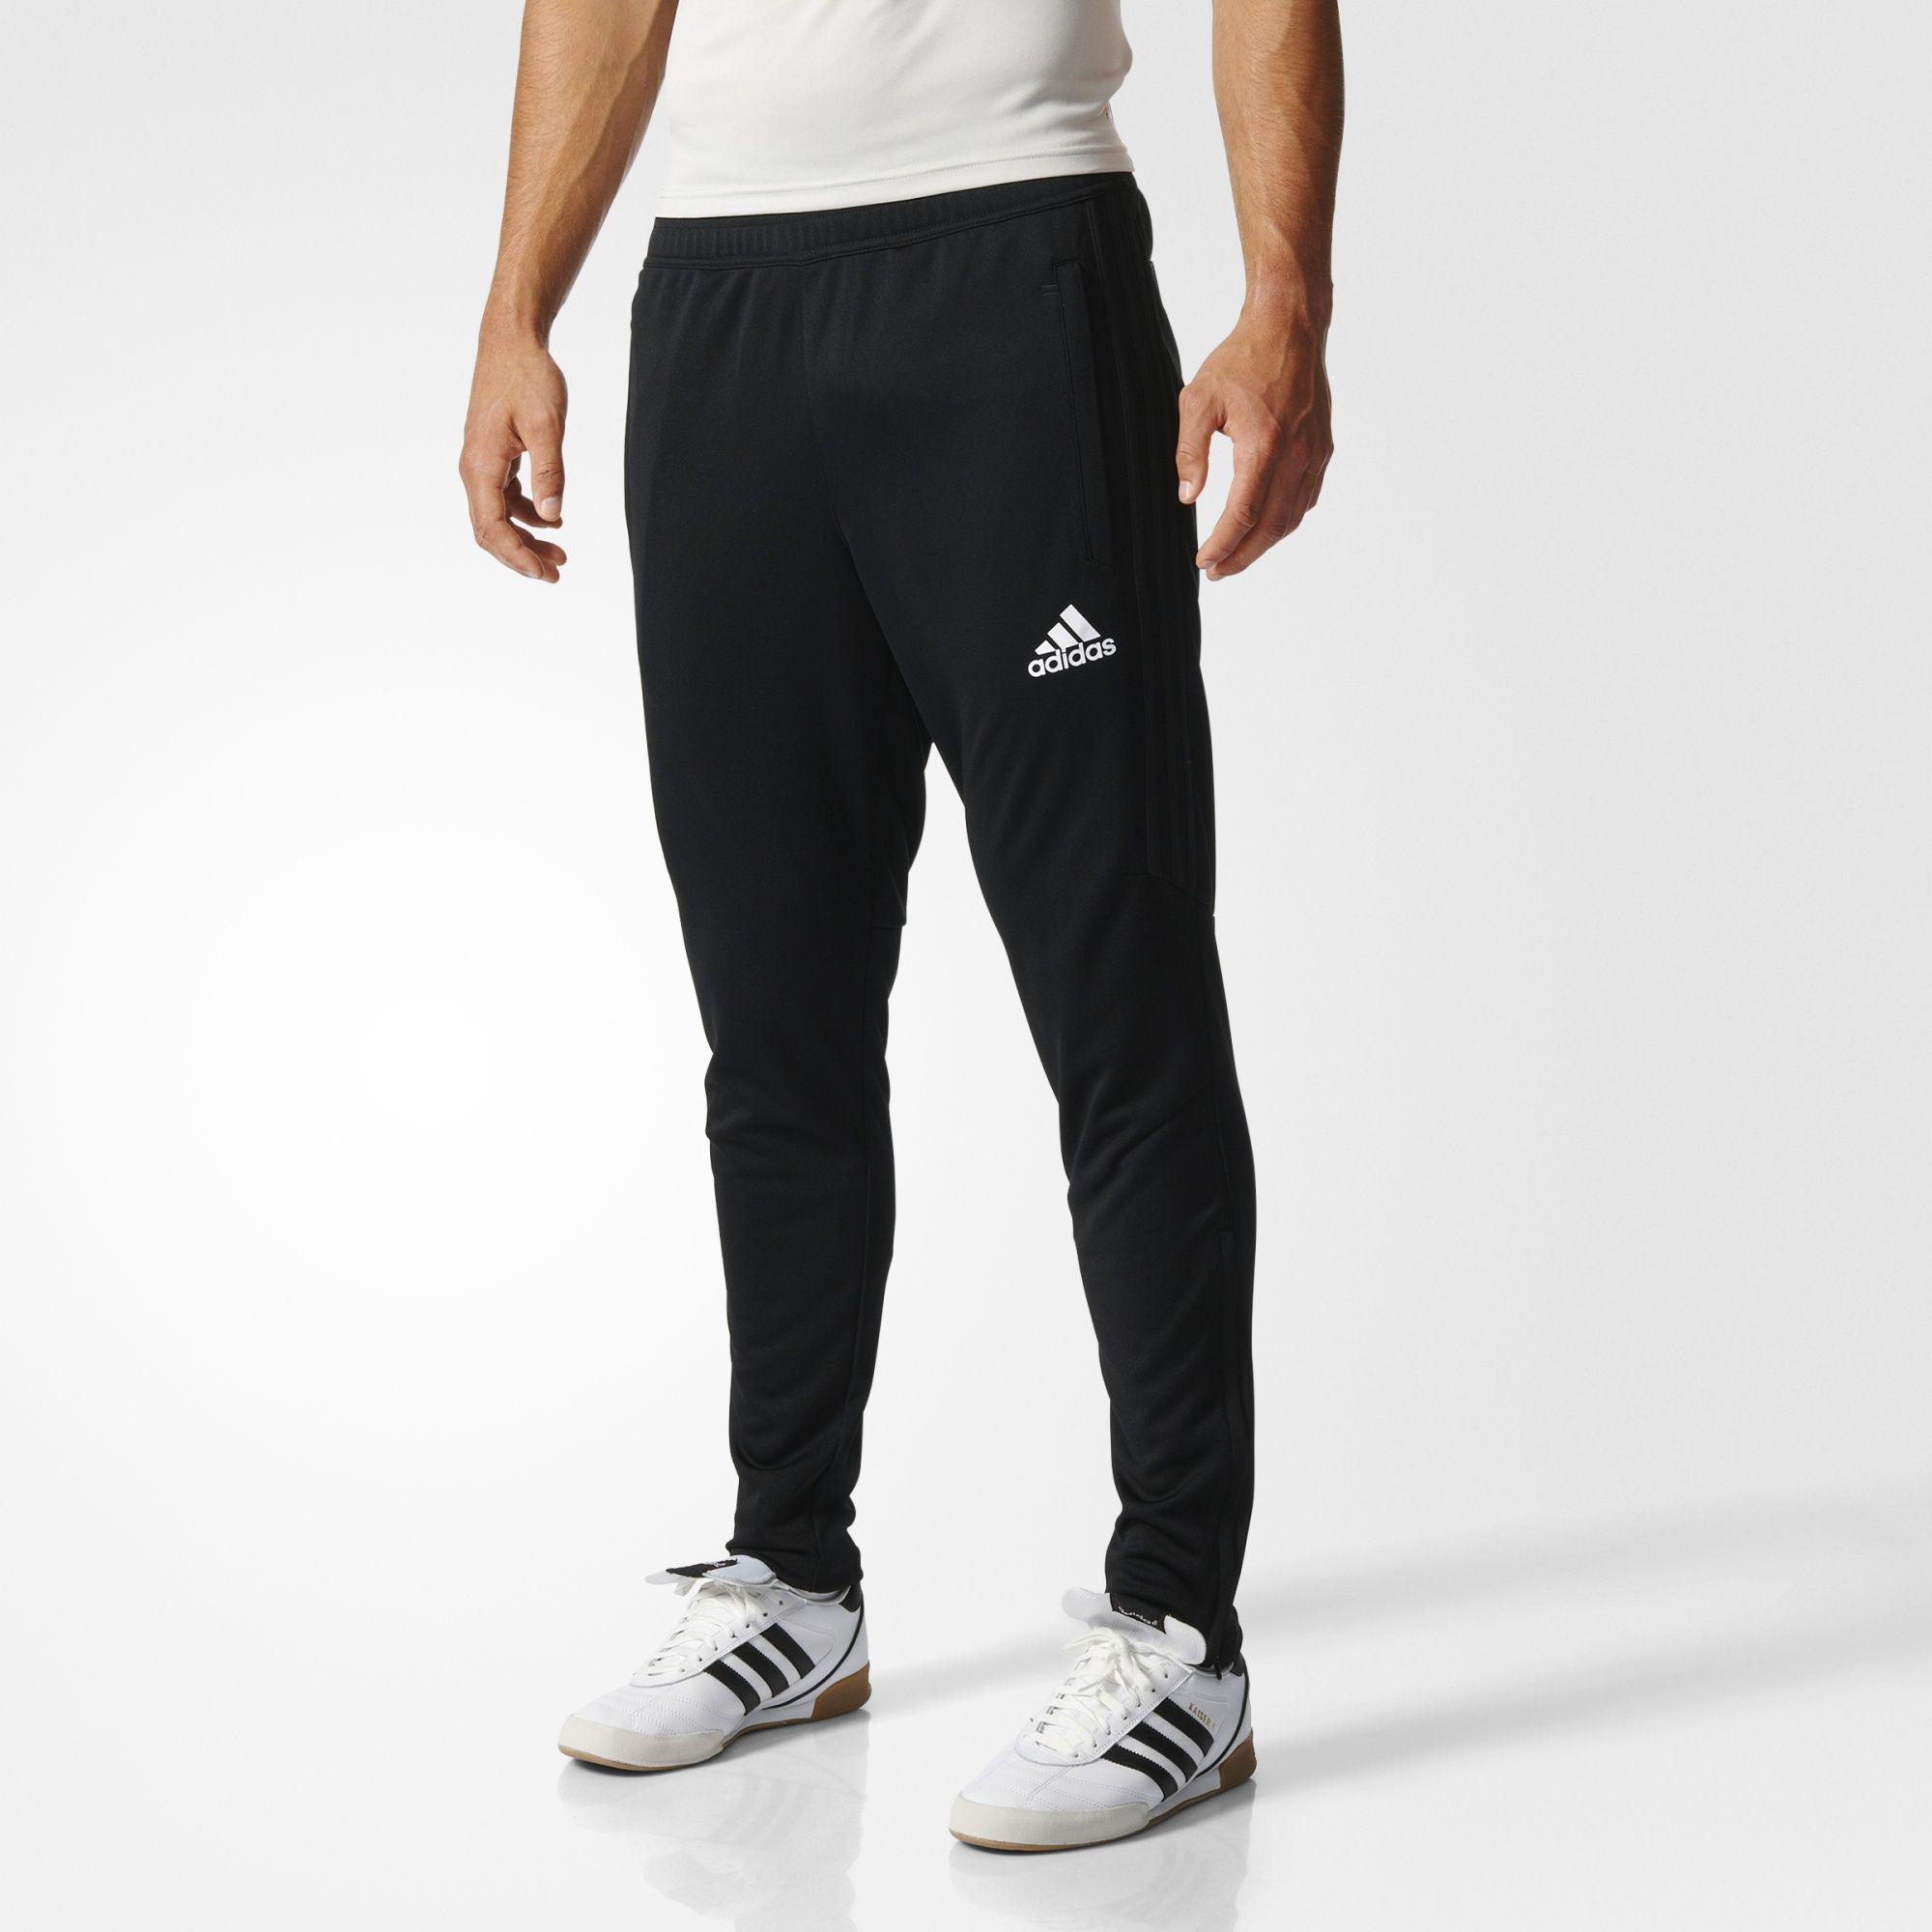 Entraînement 17 Adidas Pantalon Pantalon 17 Tiro Tiro Adidas hCQdBsrxt